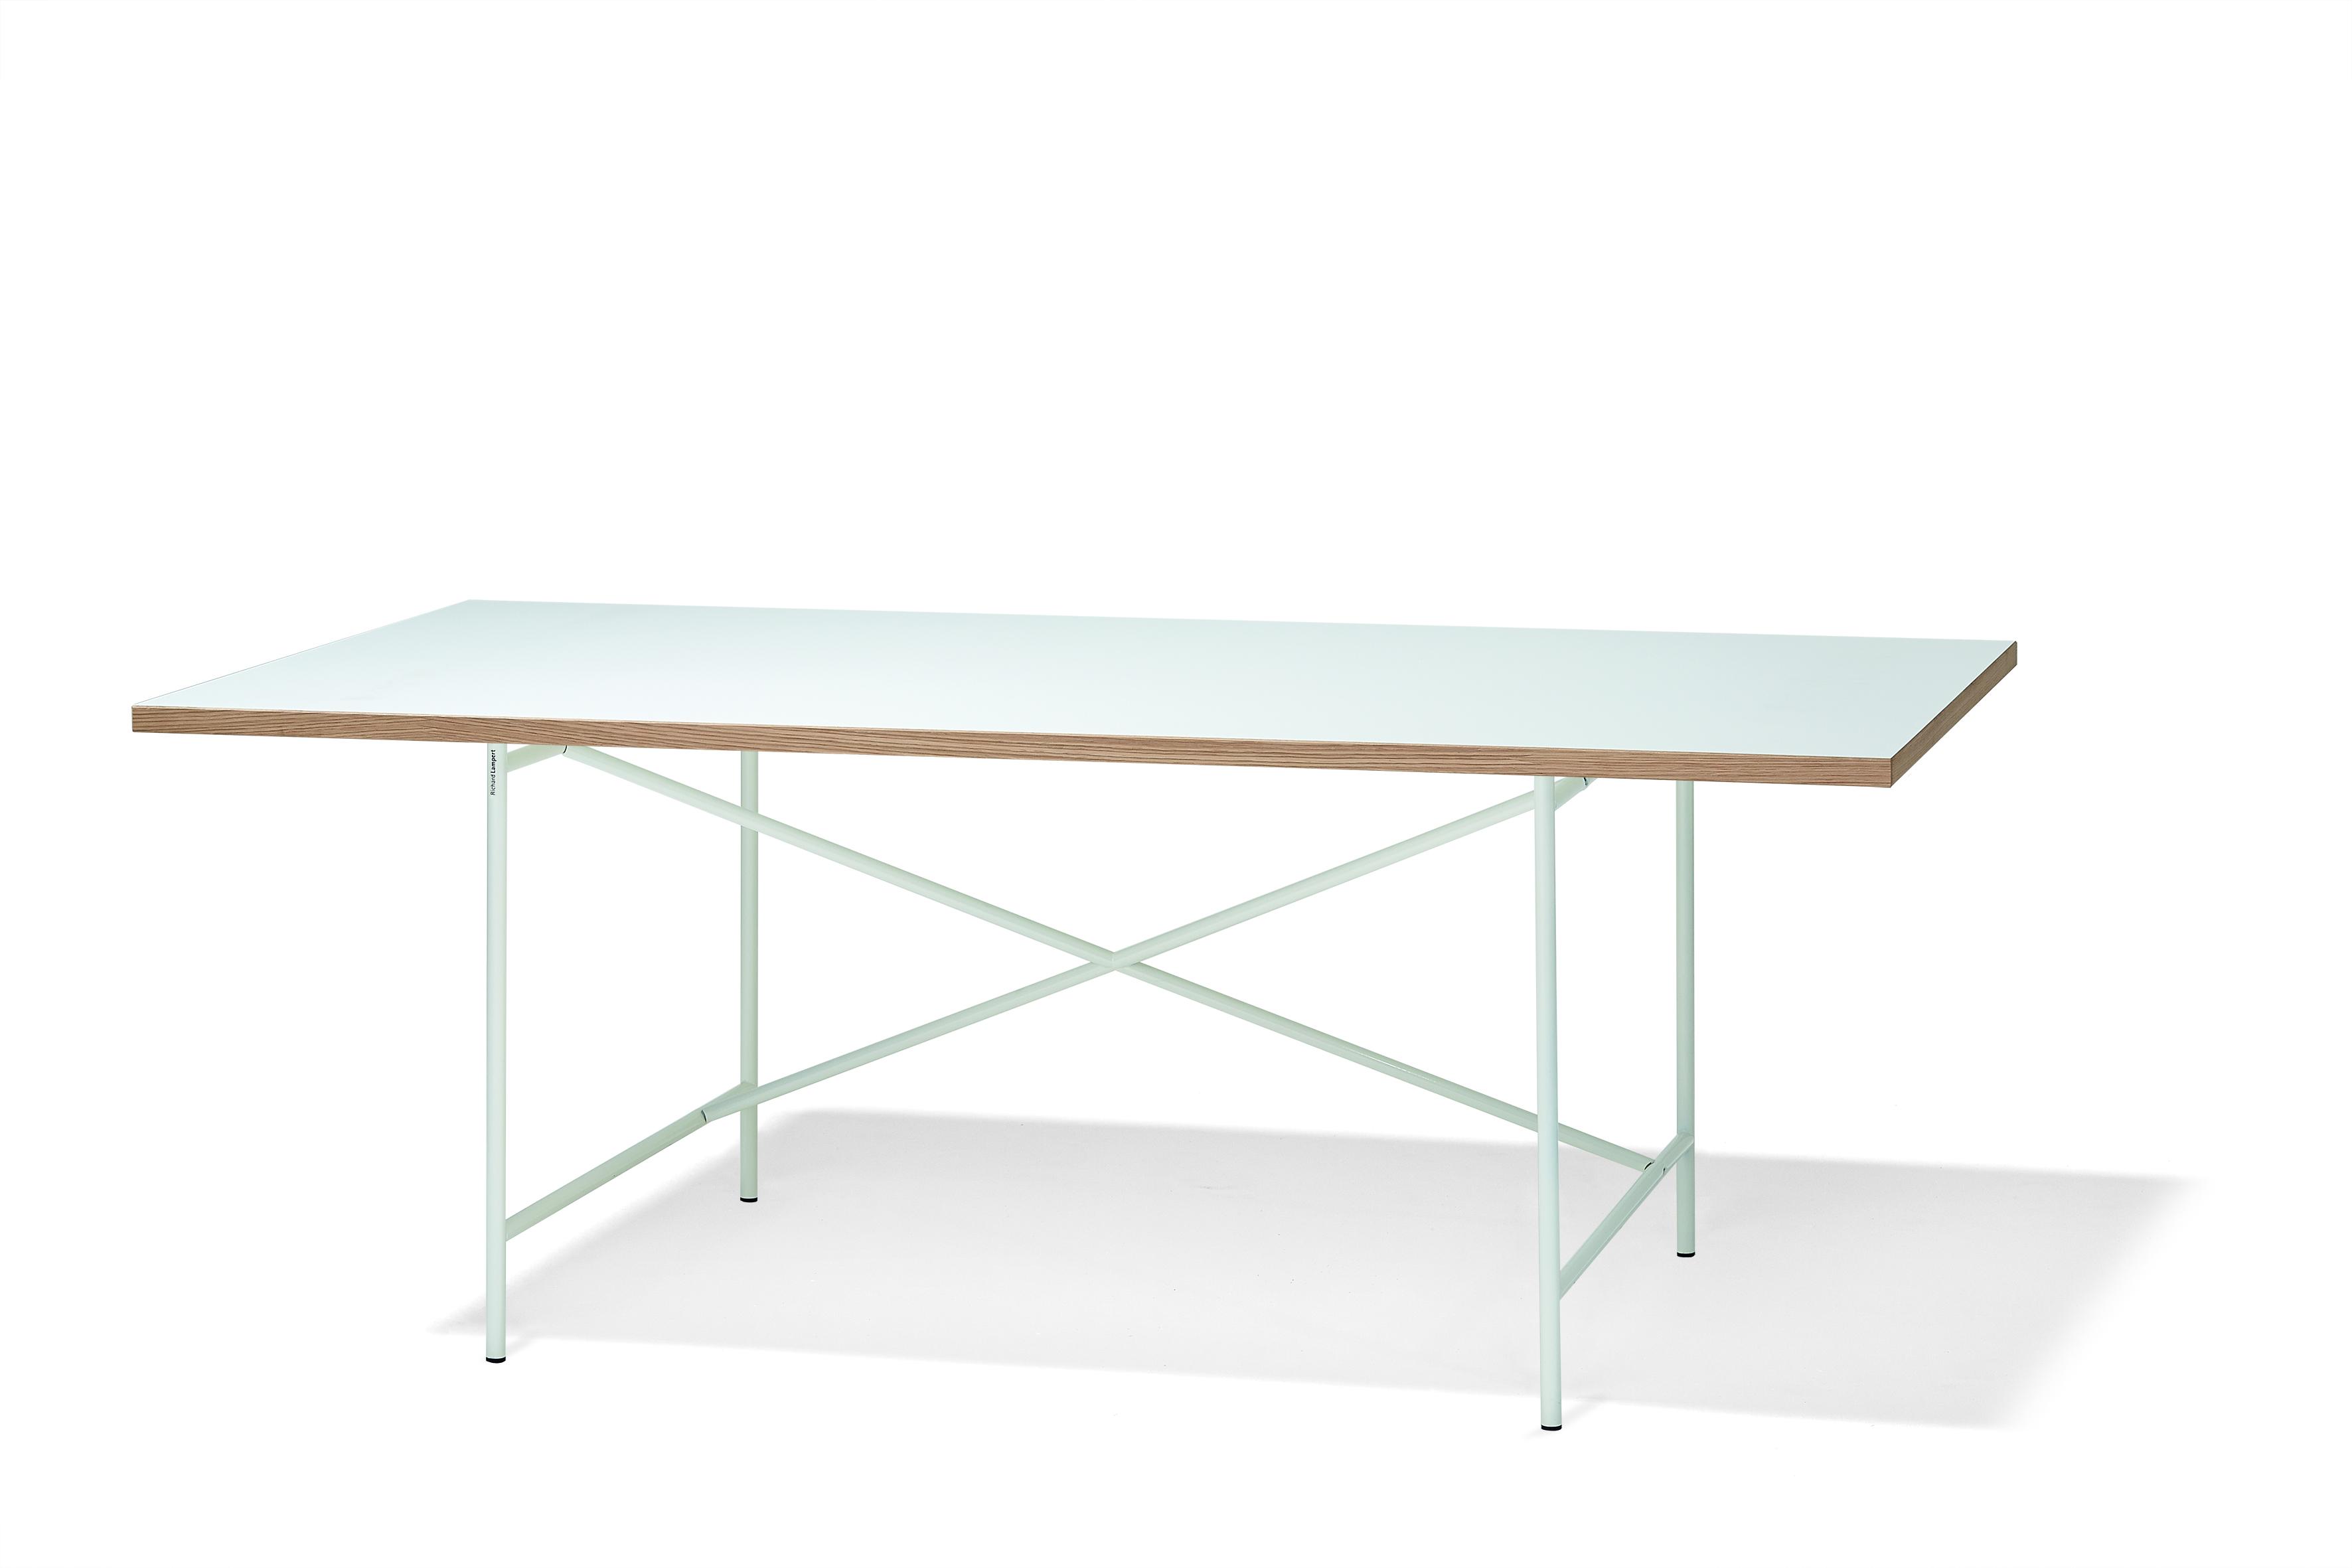 richard lampert gestell eiermann 1 egon eiermann 1965. Black Bedroom Furniture Sets. Home Design Ideas